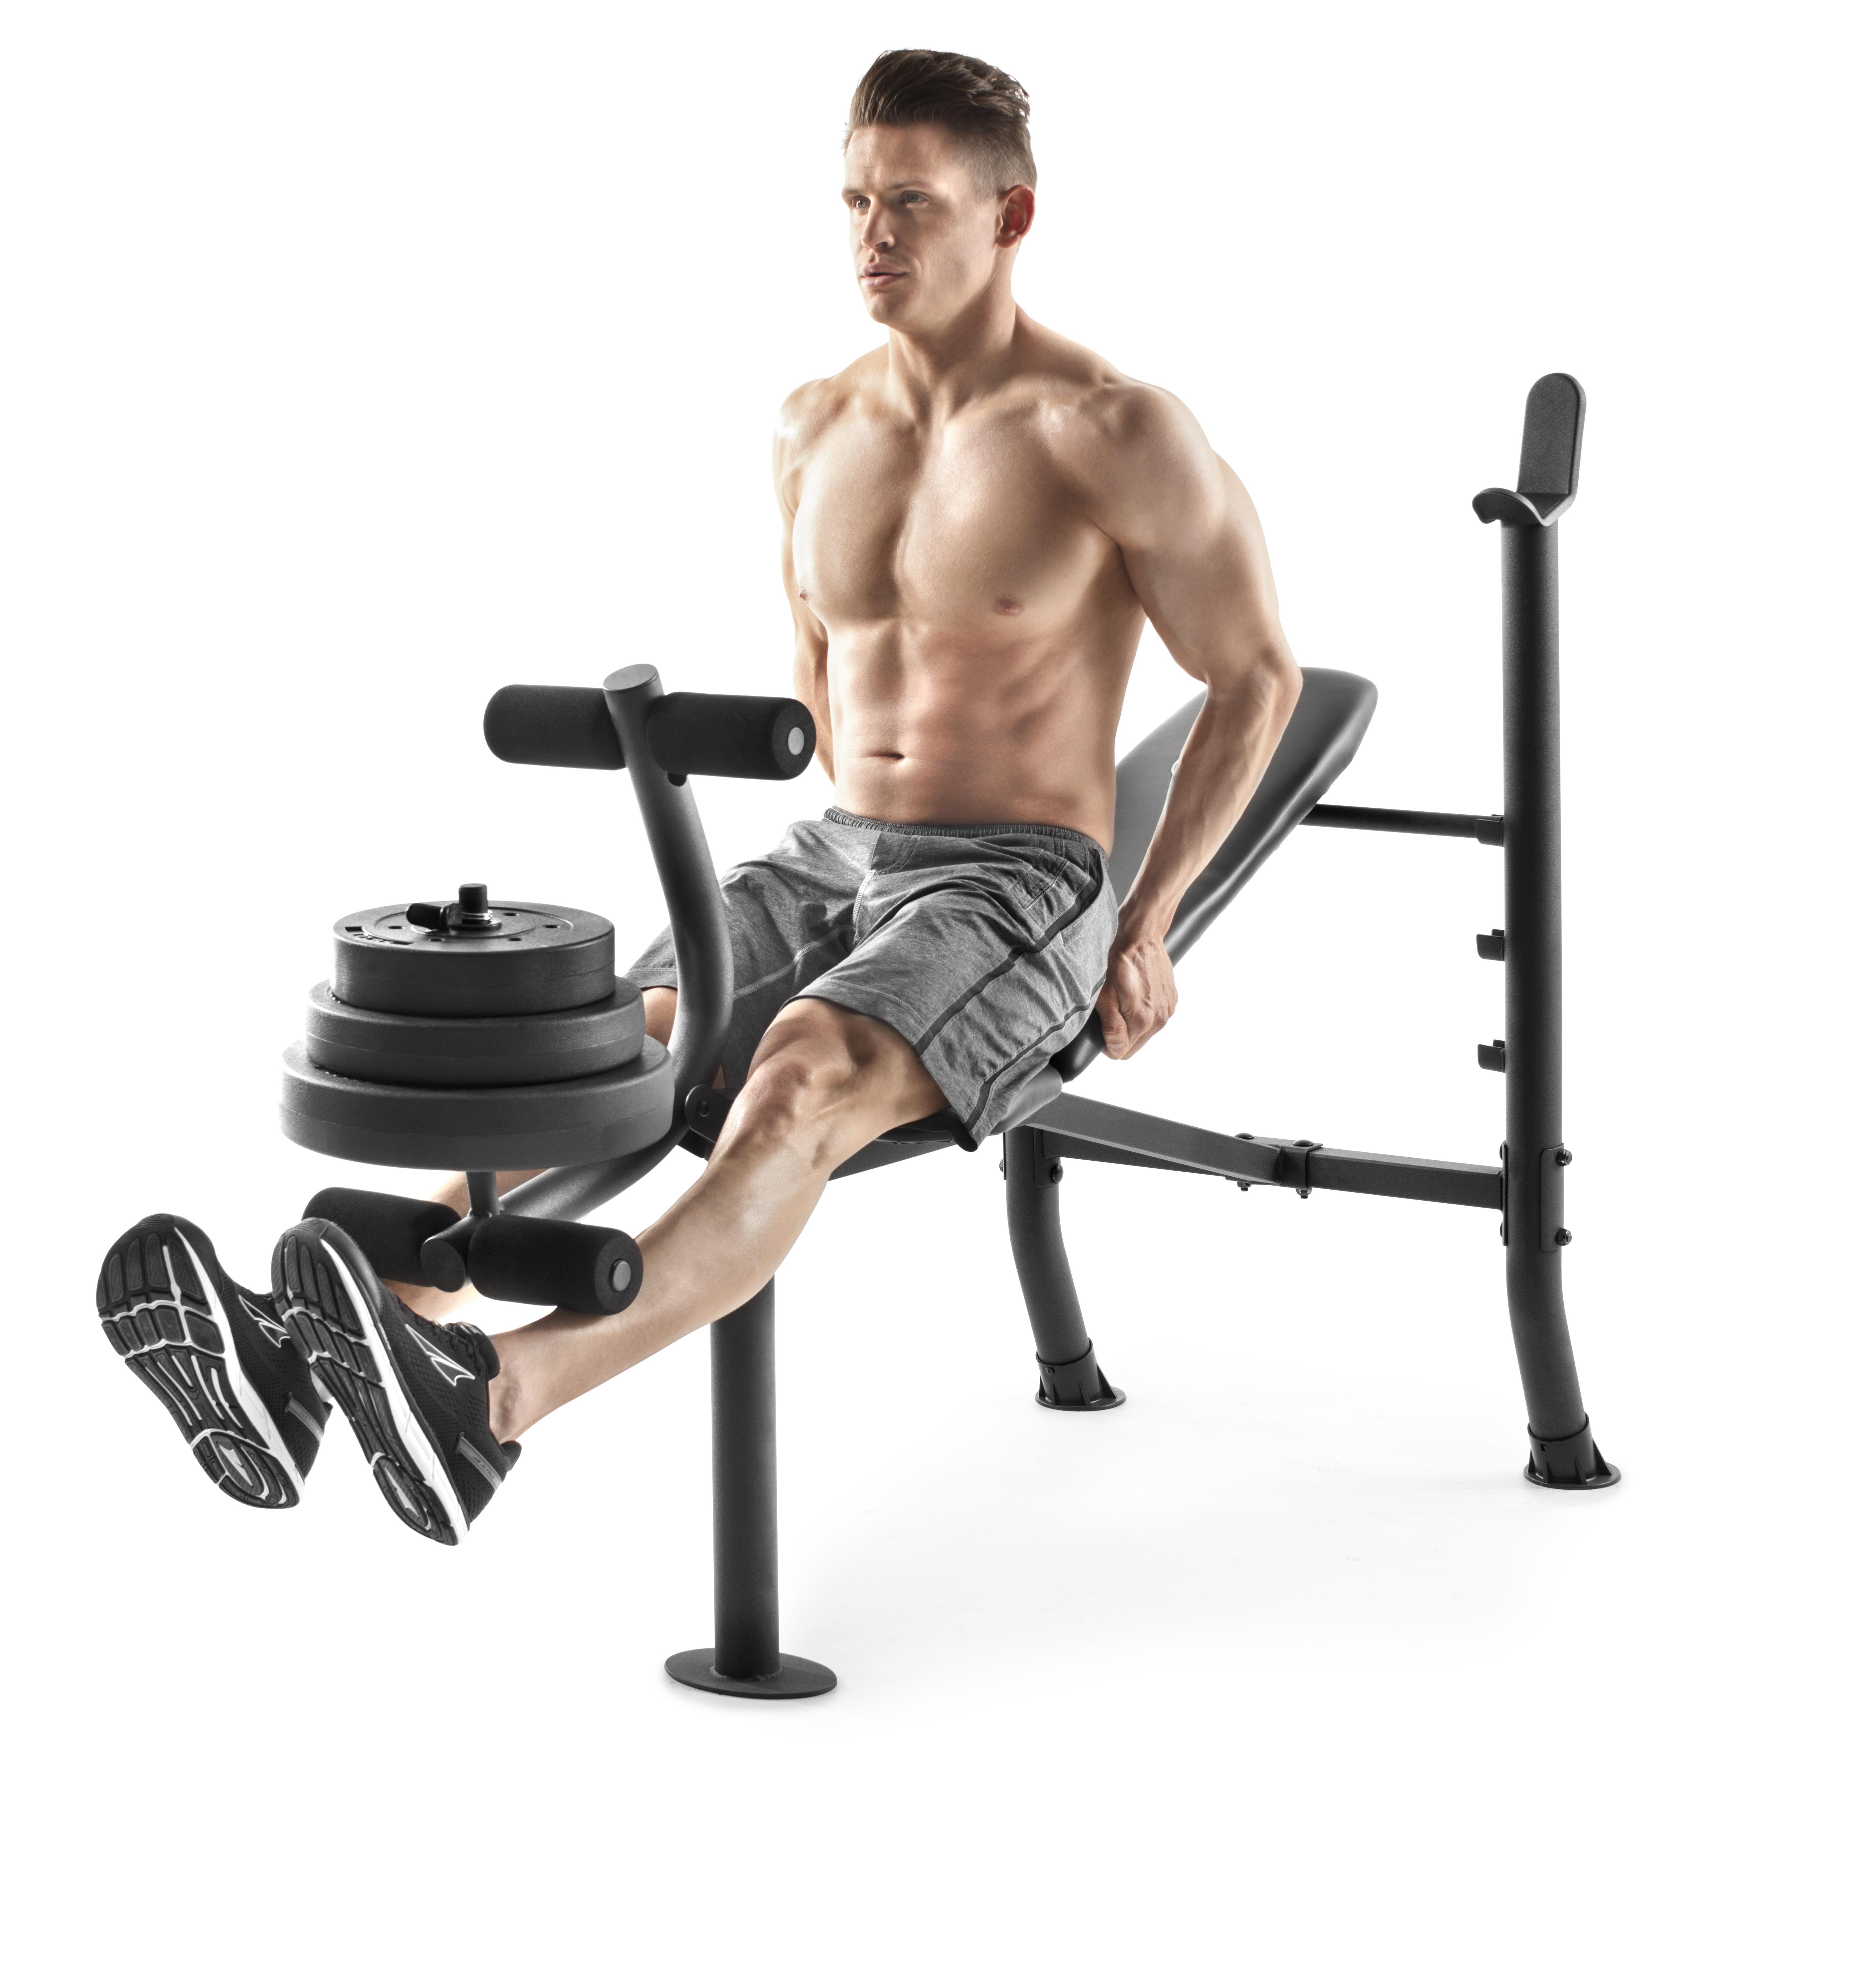 Weider XR 6.1 Adjustable Bench with 100lb Weight Set and Leg Developer $169.99 w/ FS @ WM